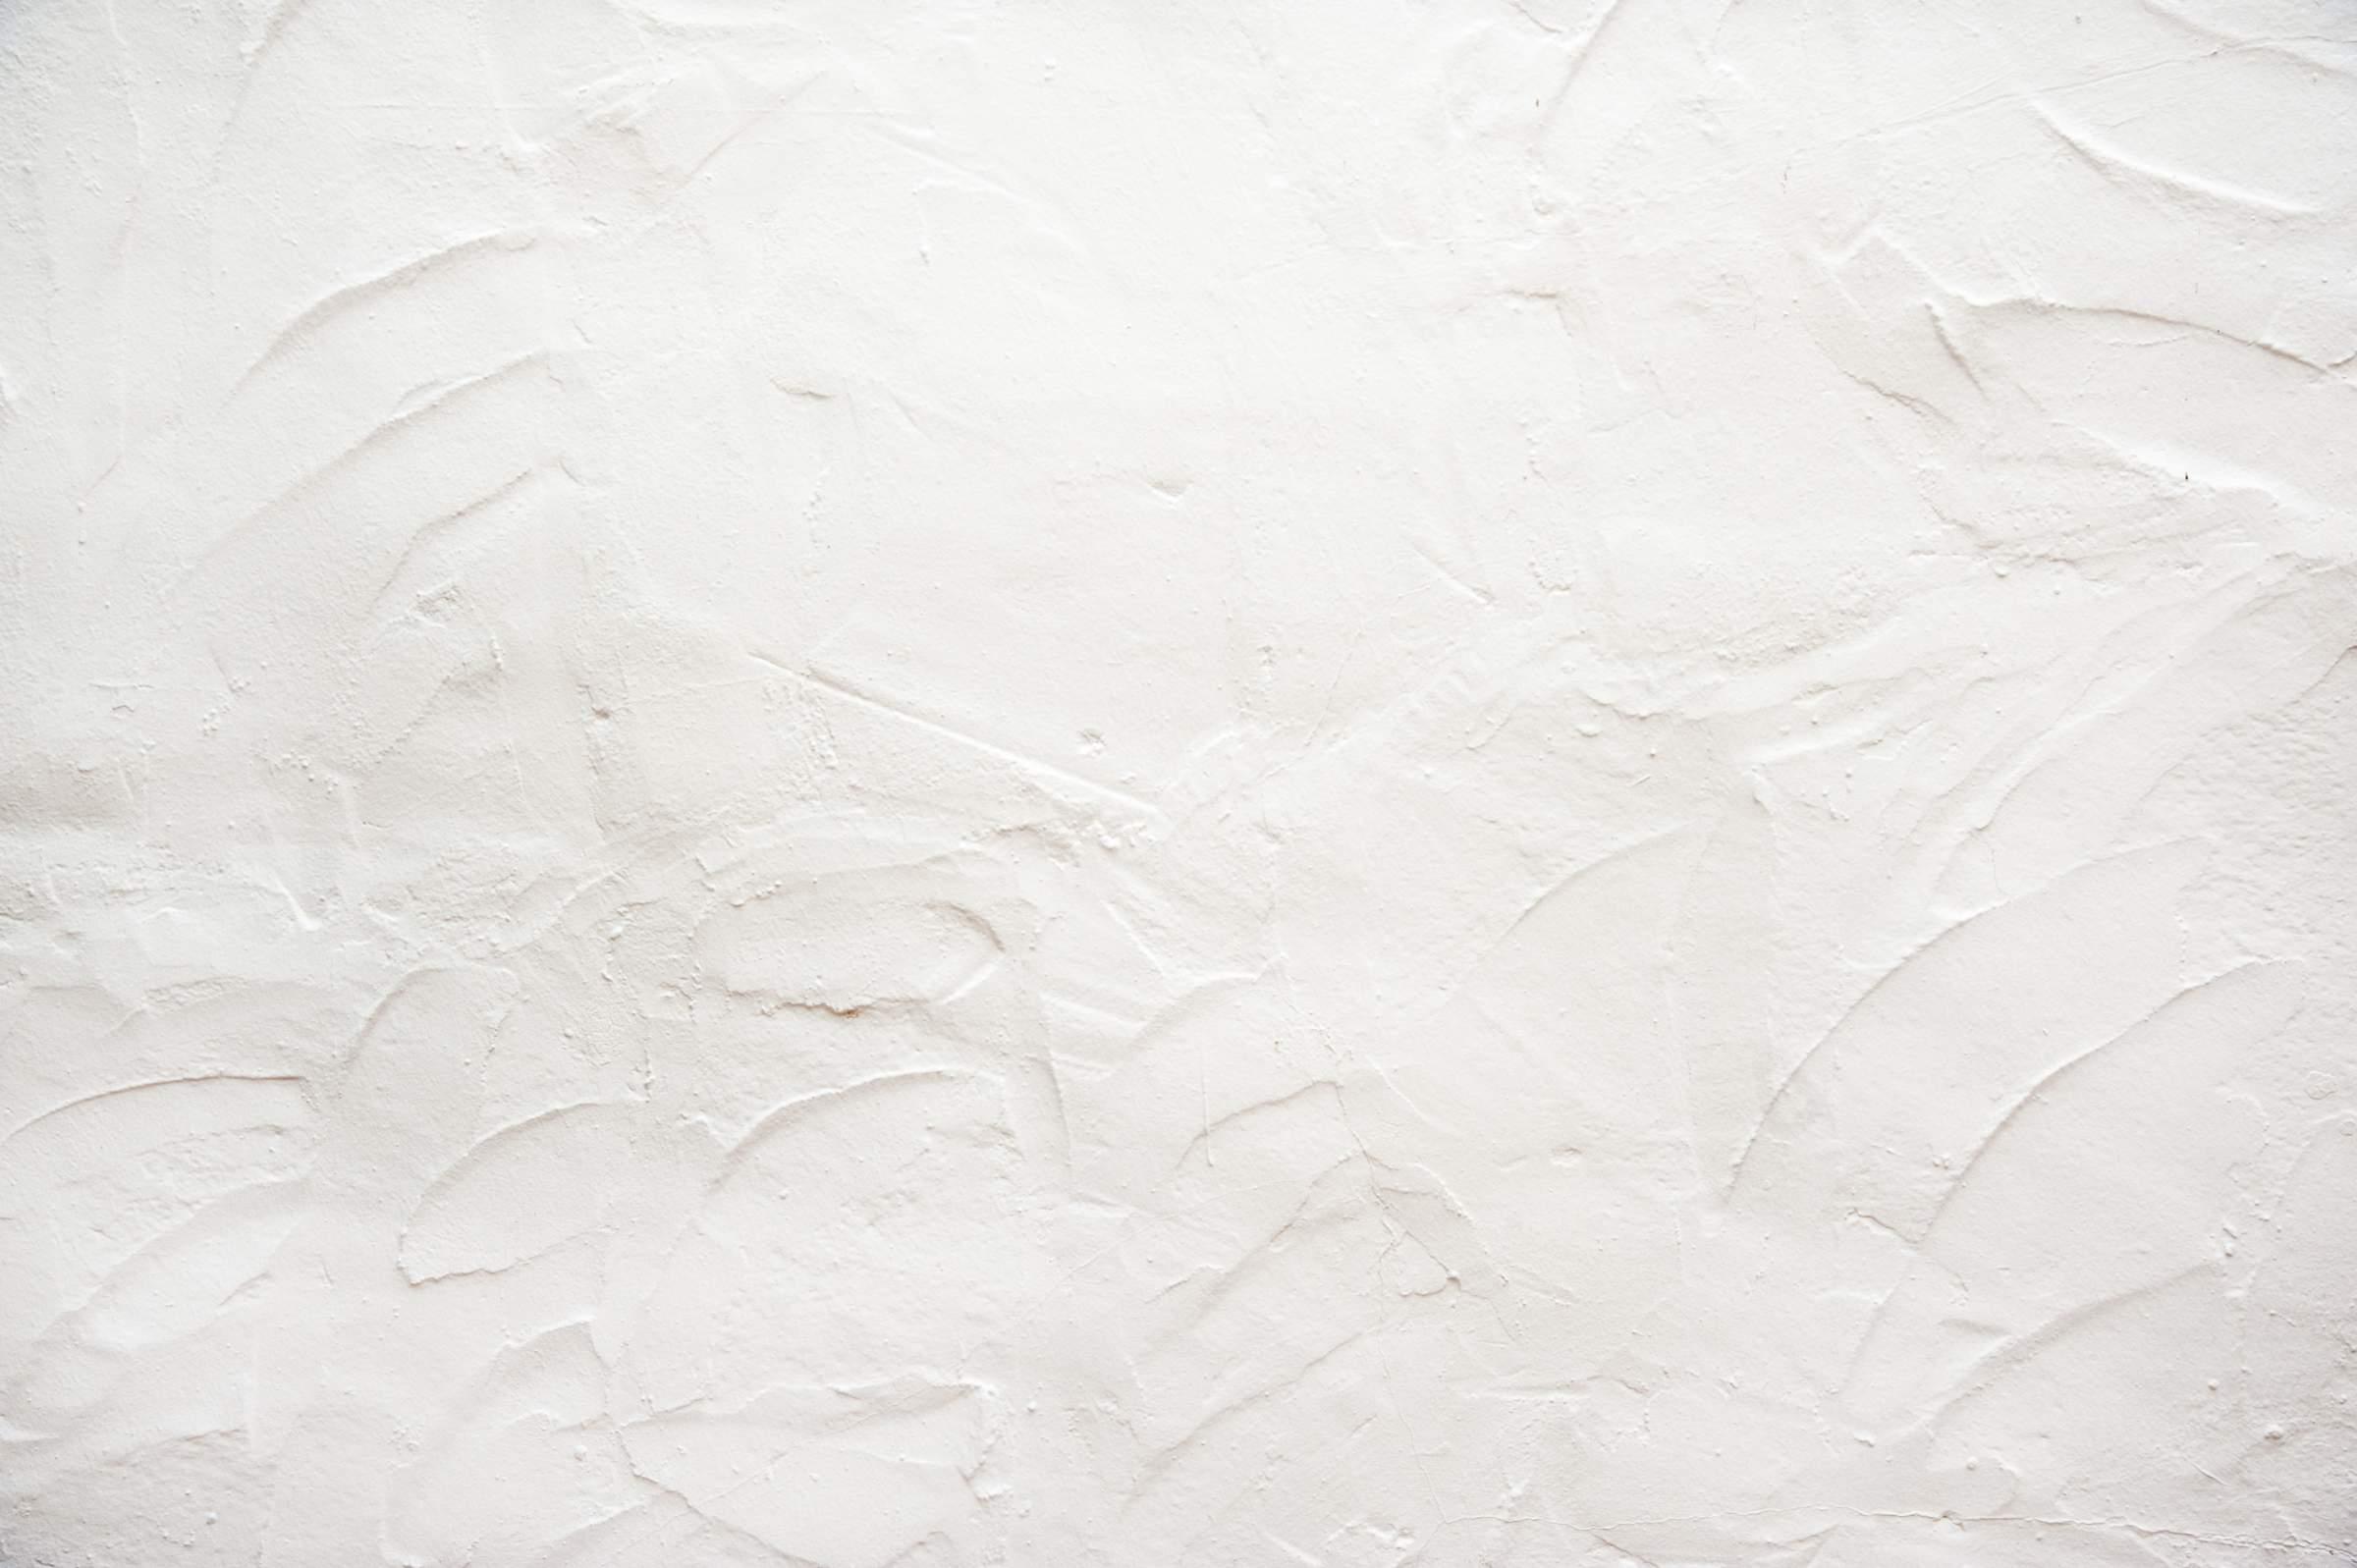 free photo wall texture